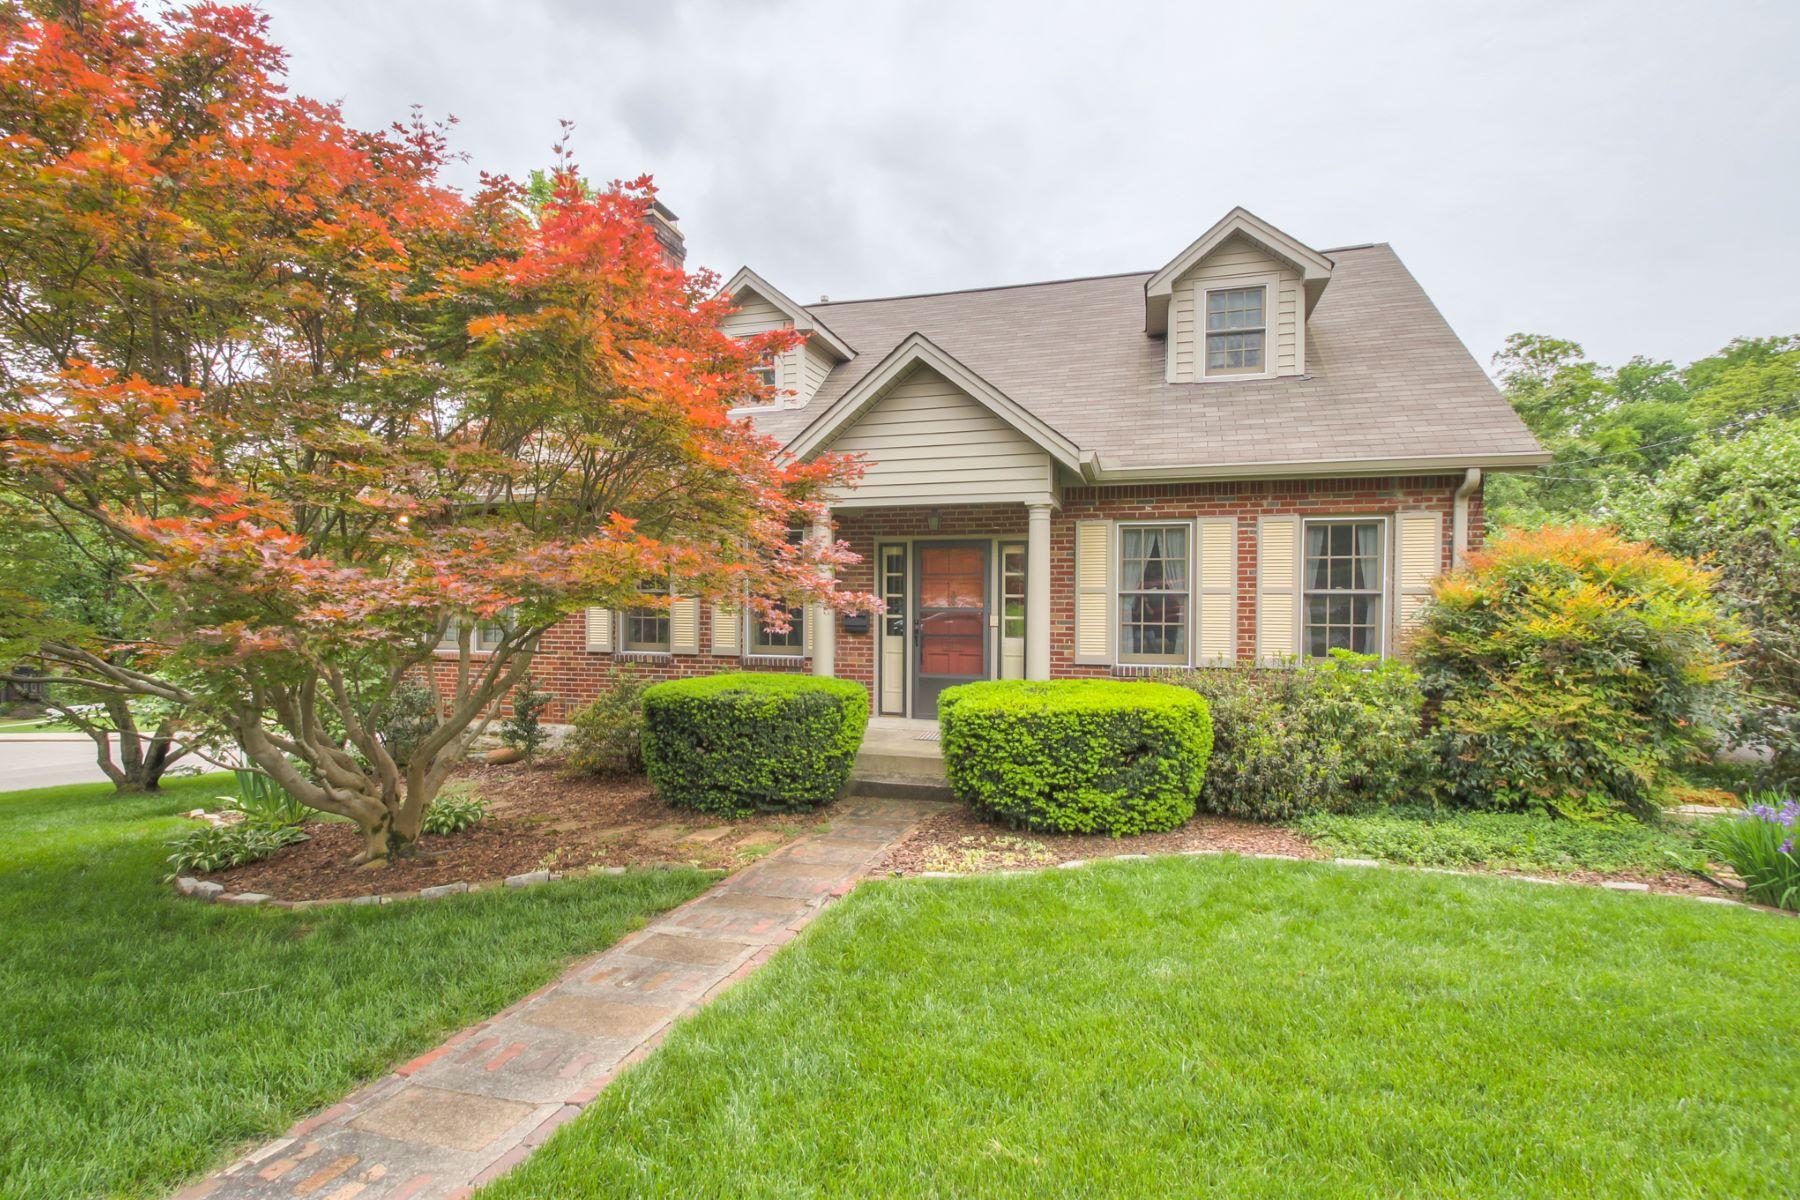 独户住宅 为 销售 在 Boundless Cape Cod Home on Acklen 3201 Acklen Ave 那什维尔, 田纳西州 37212 美国